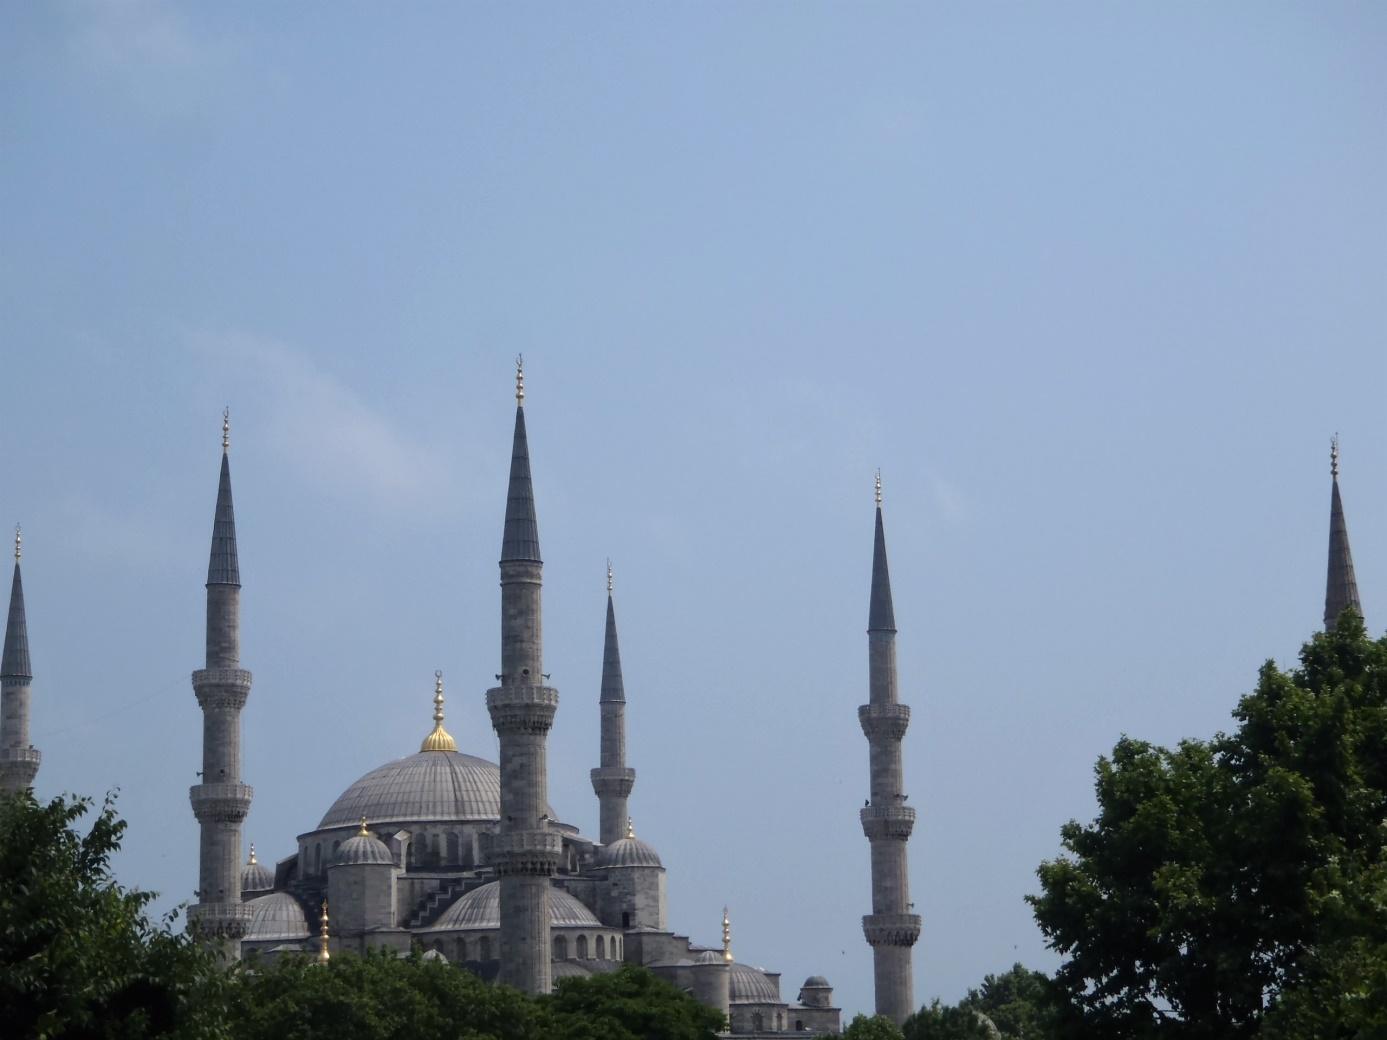 C:\Users\Administrator\Documents\Documents\Putovanja\PUTOPISI\TURSKA\1\Slike\1a.jpg